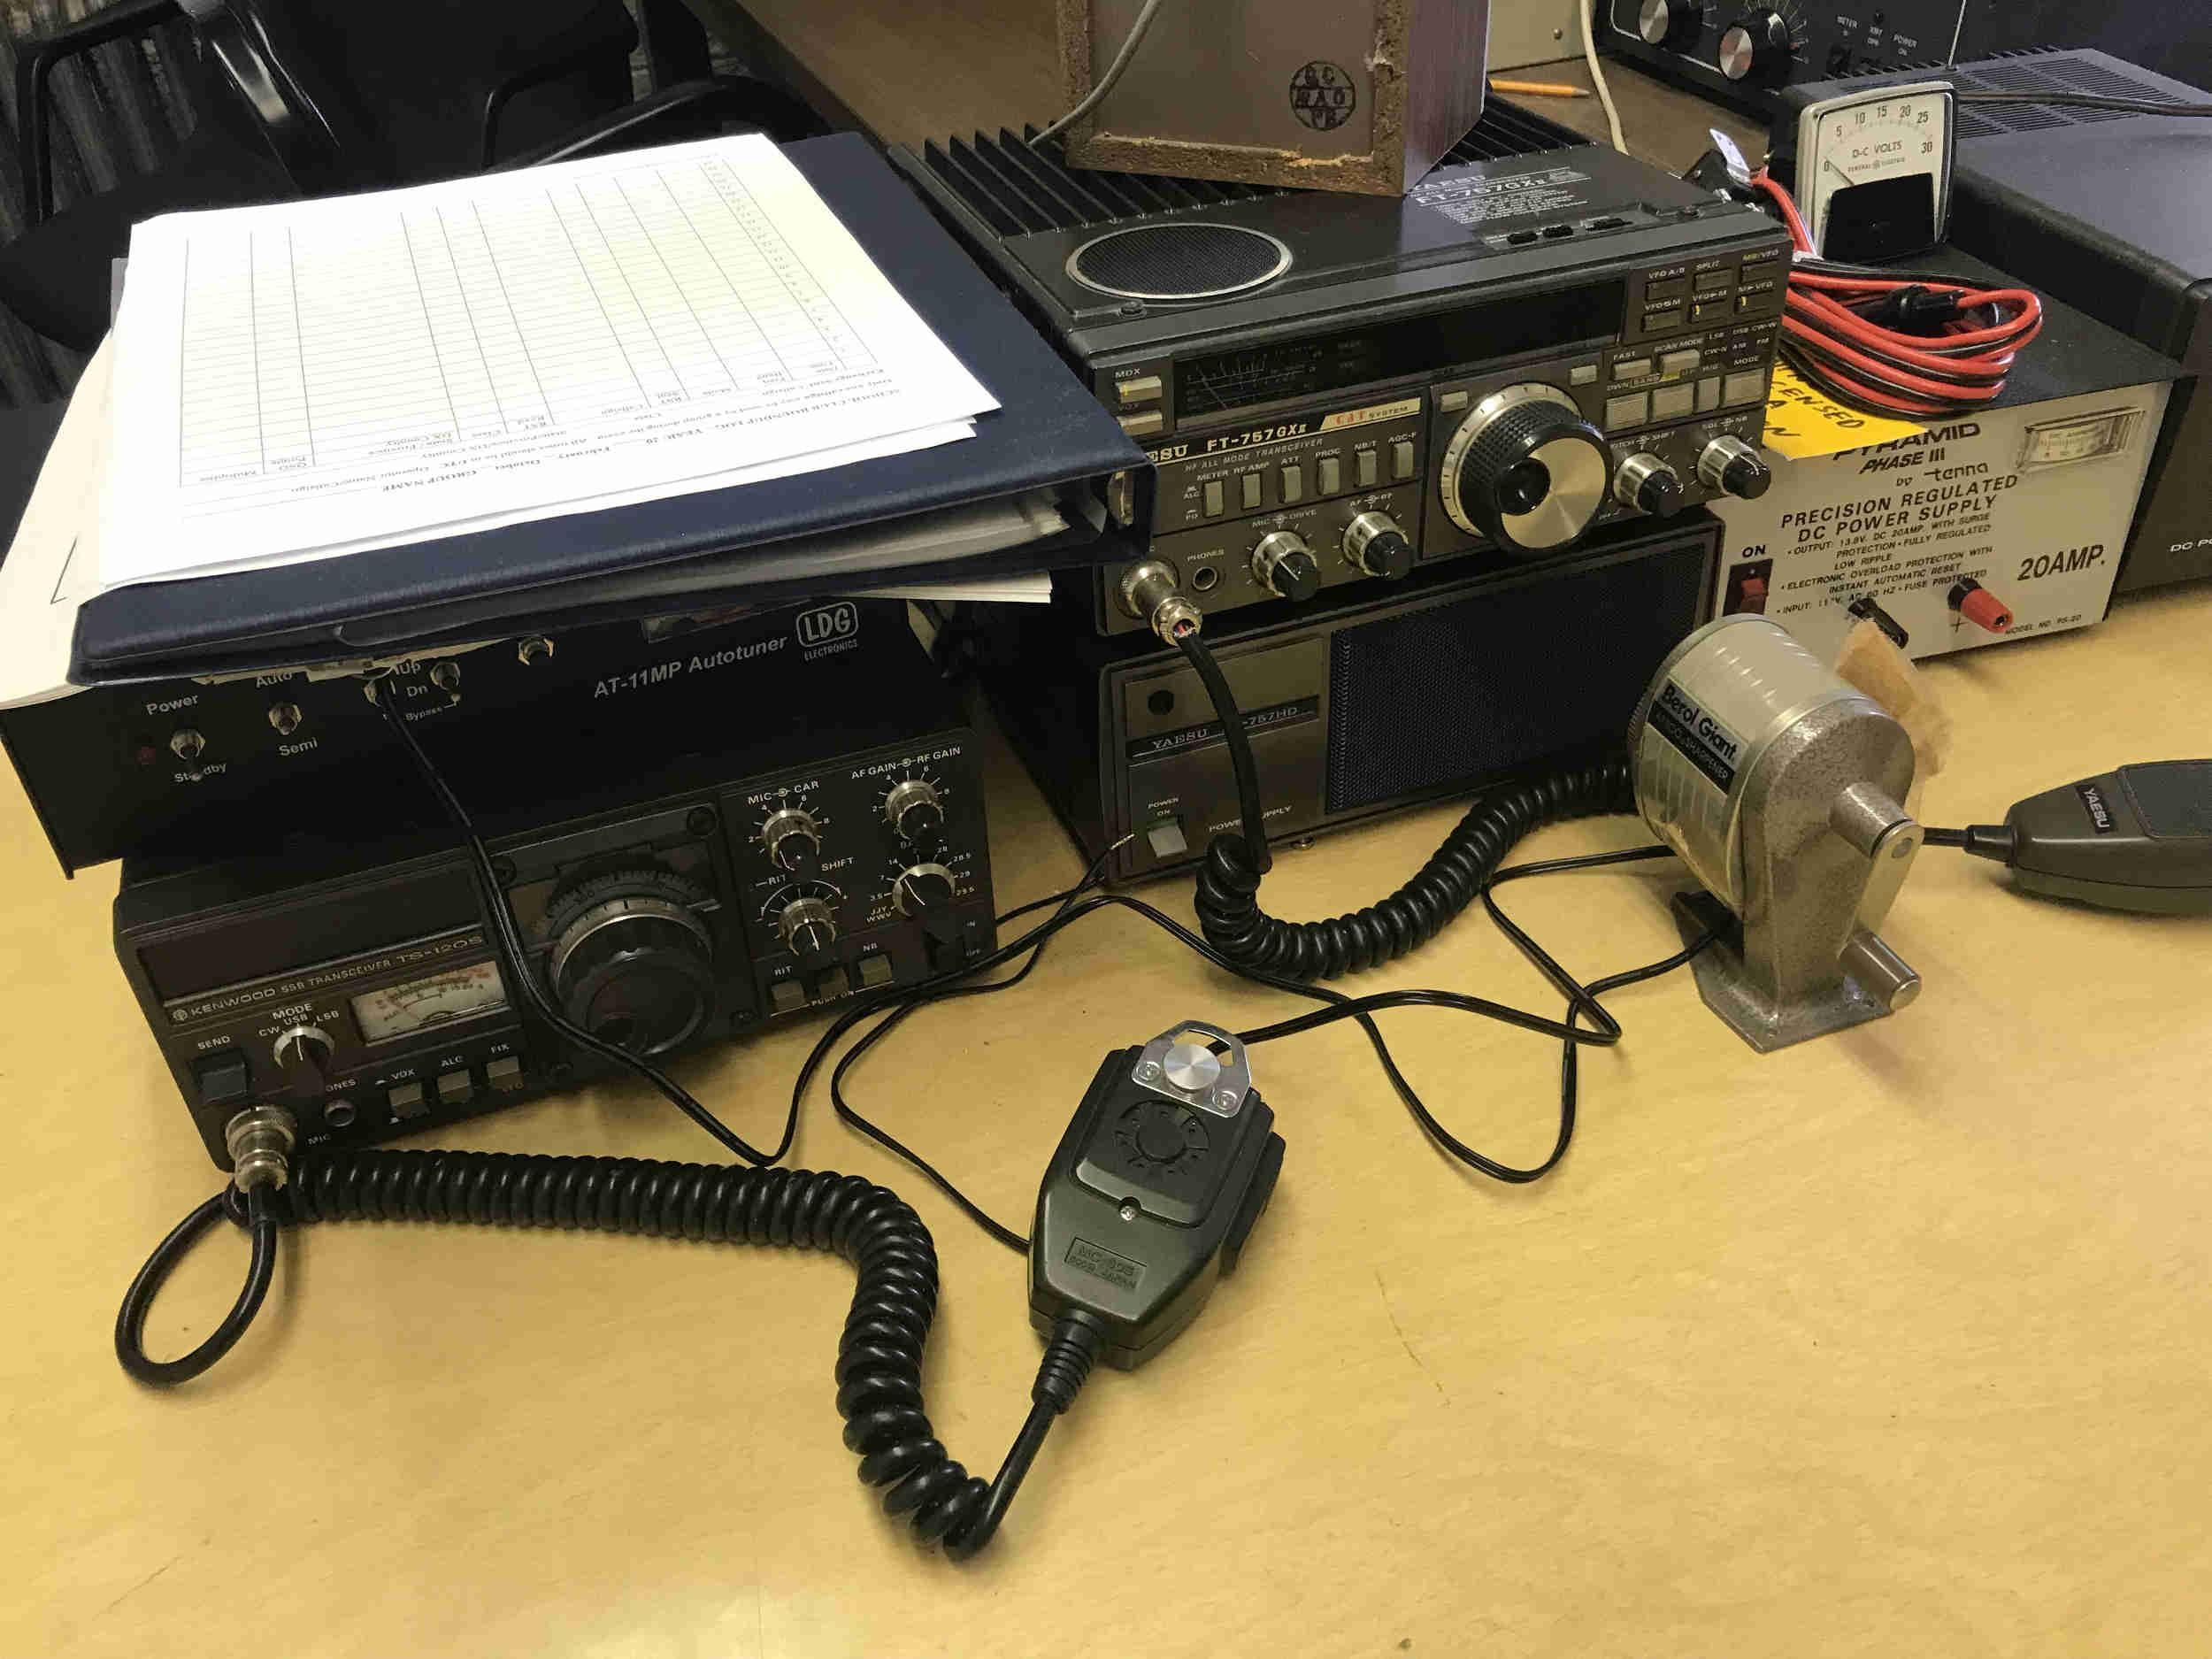 More UTARC Radios